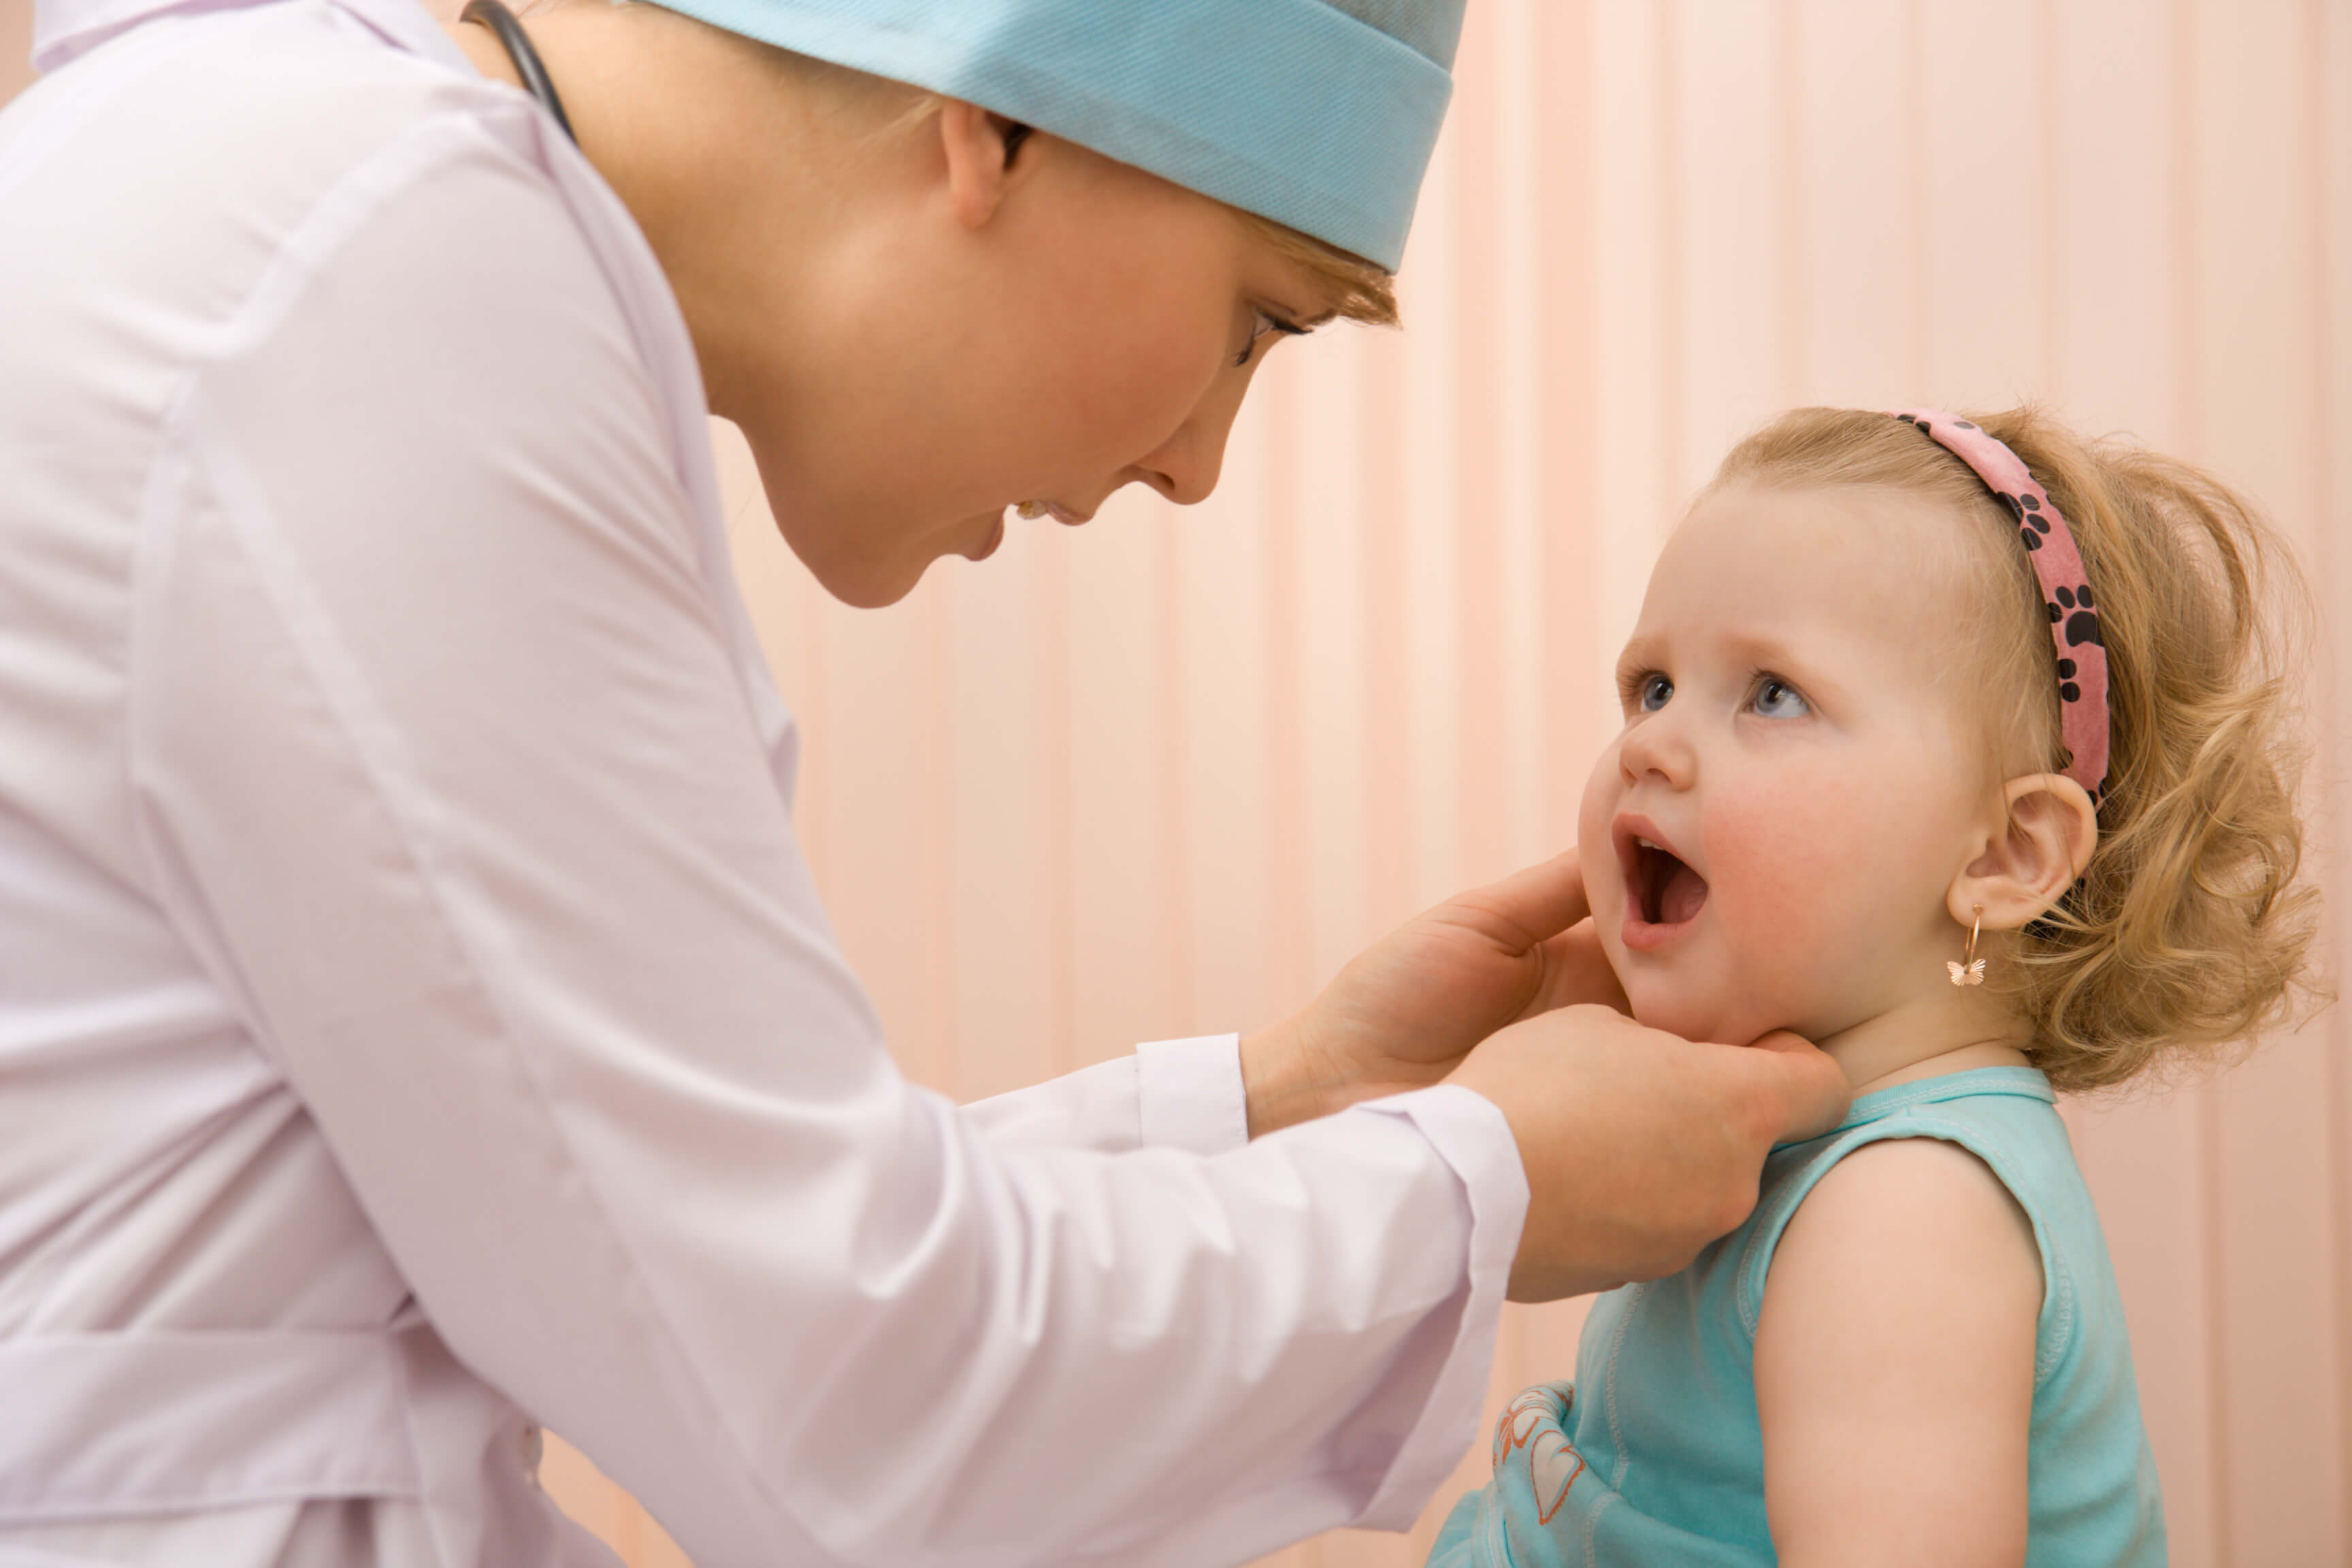 Как давать Мукалтин детям: назначение, возраст и дозировка препарата